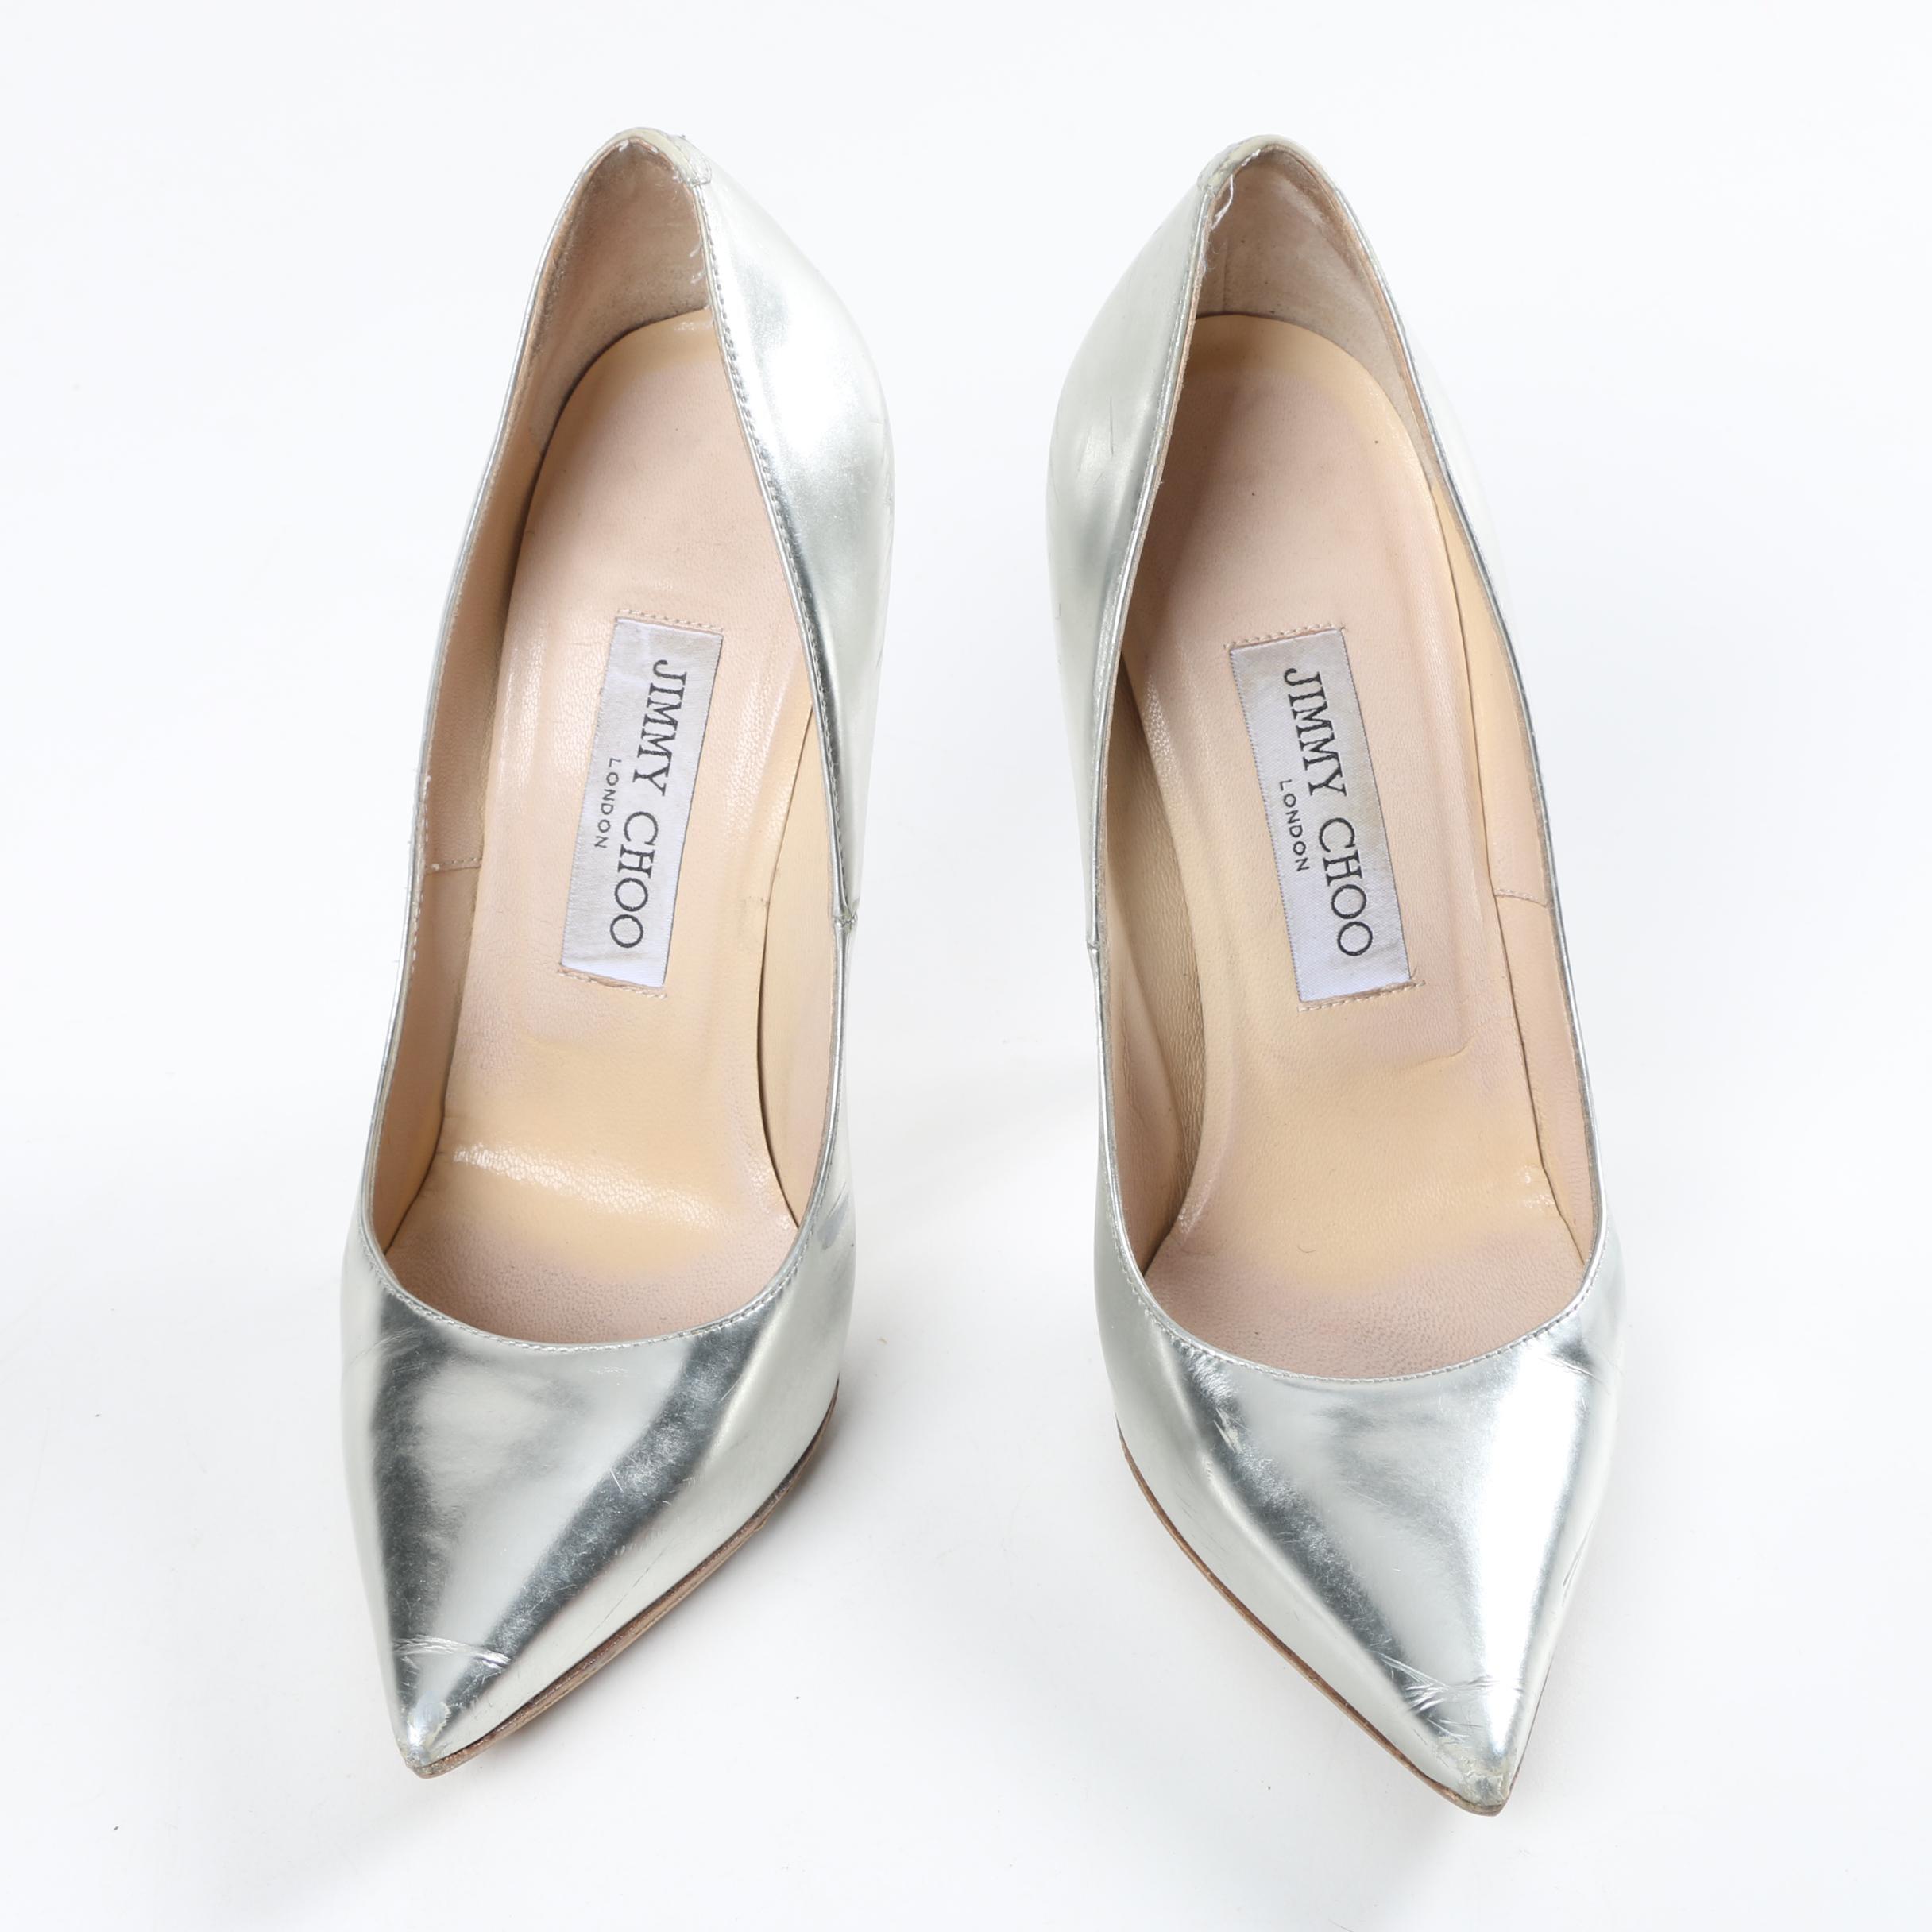 Jimmy Choo Metallic Silver Heels